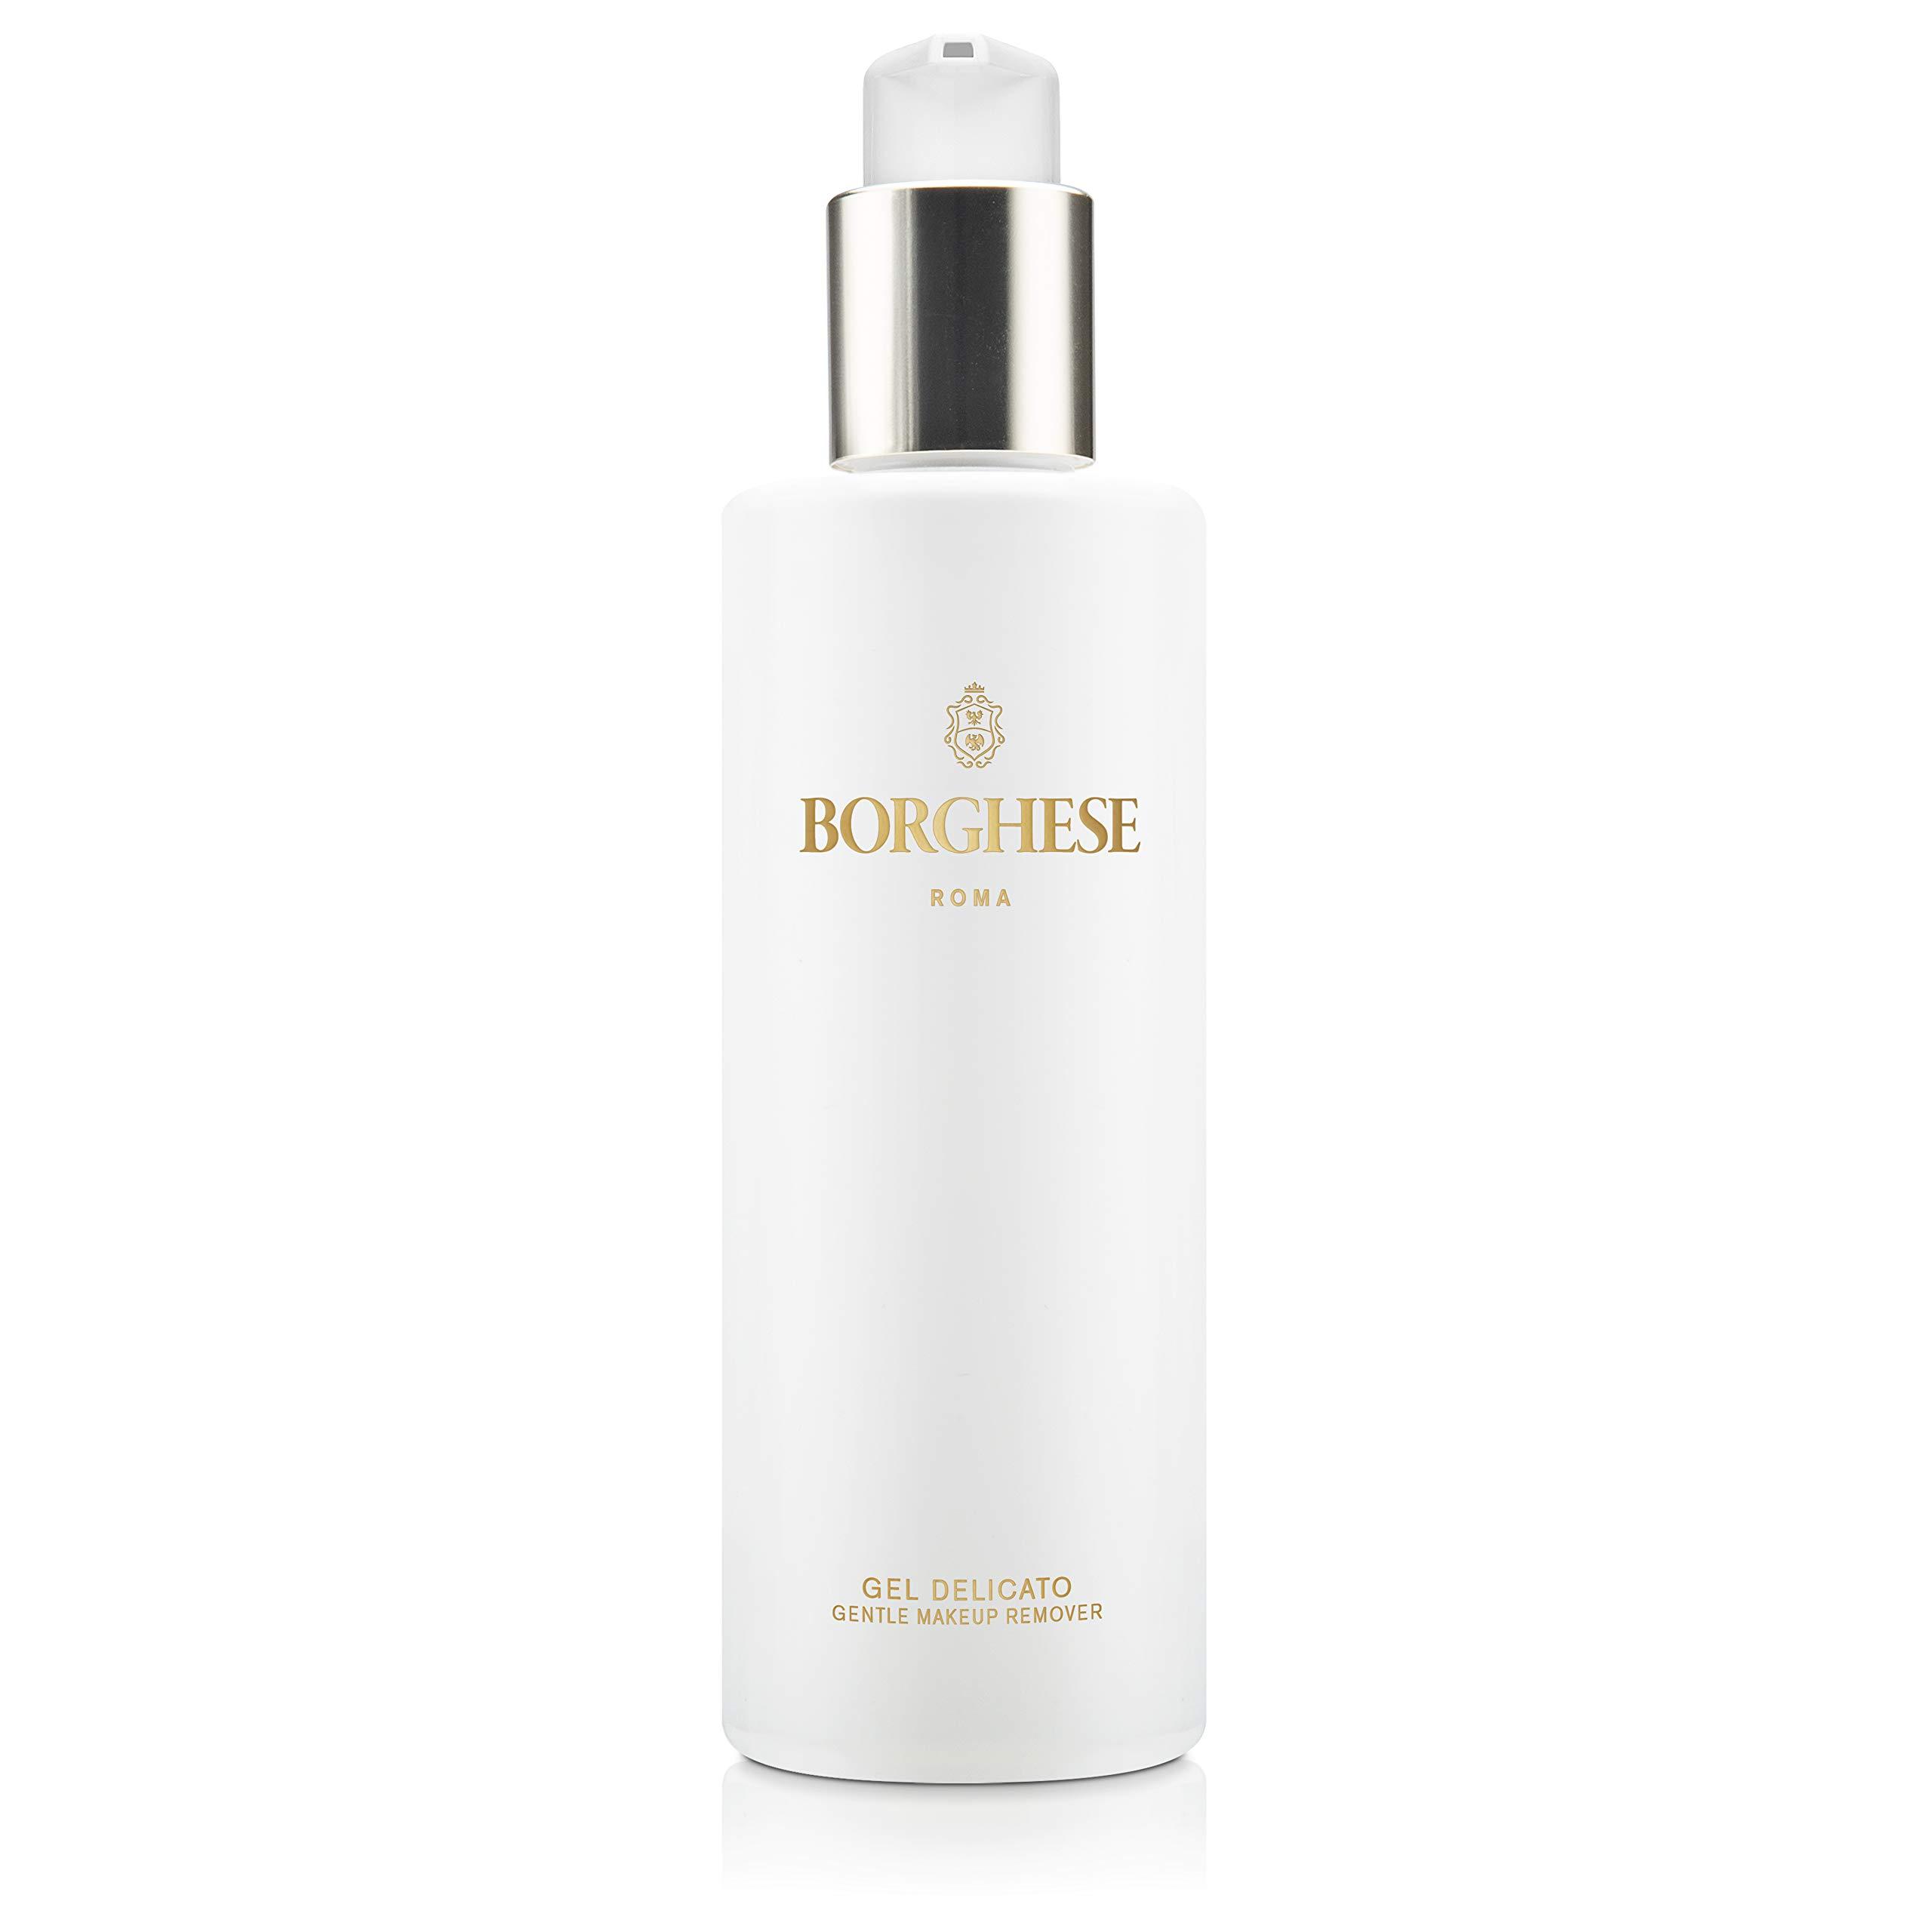 Borghese Gel Delicato Oil Free Gentle Makeup Remover, 8 oz.